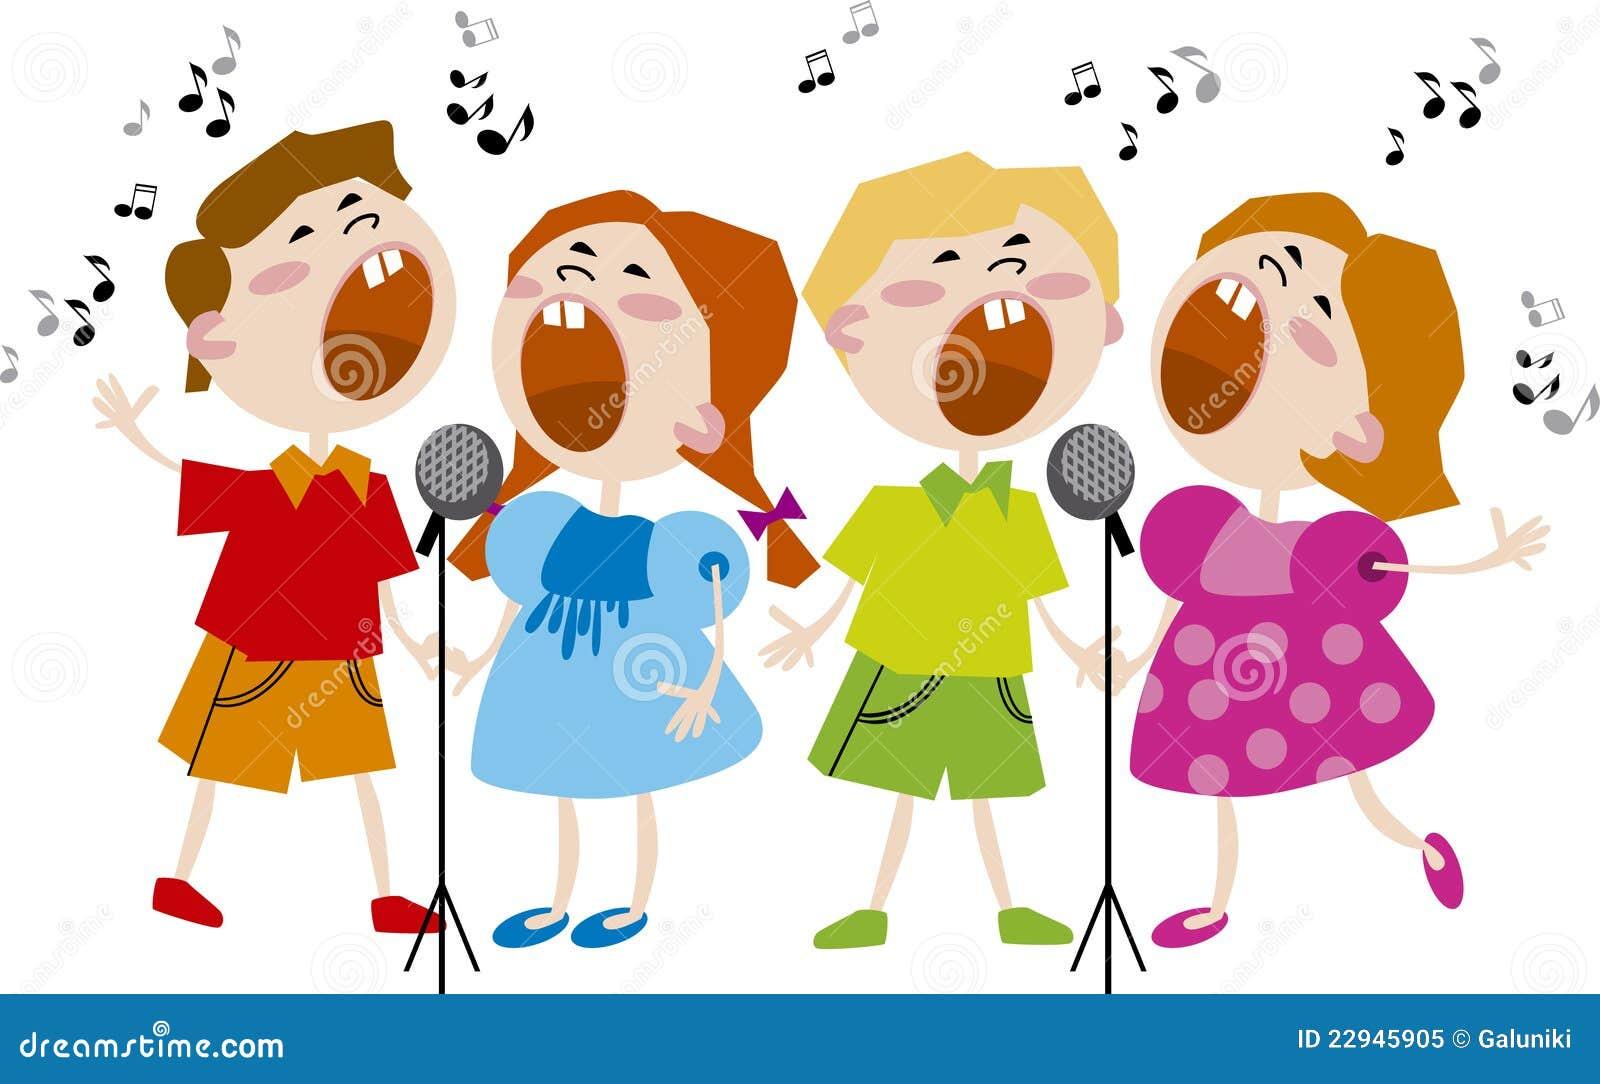 Kids Choir Royalty Free Stock Photo - Image: 22945905